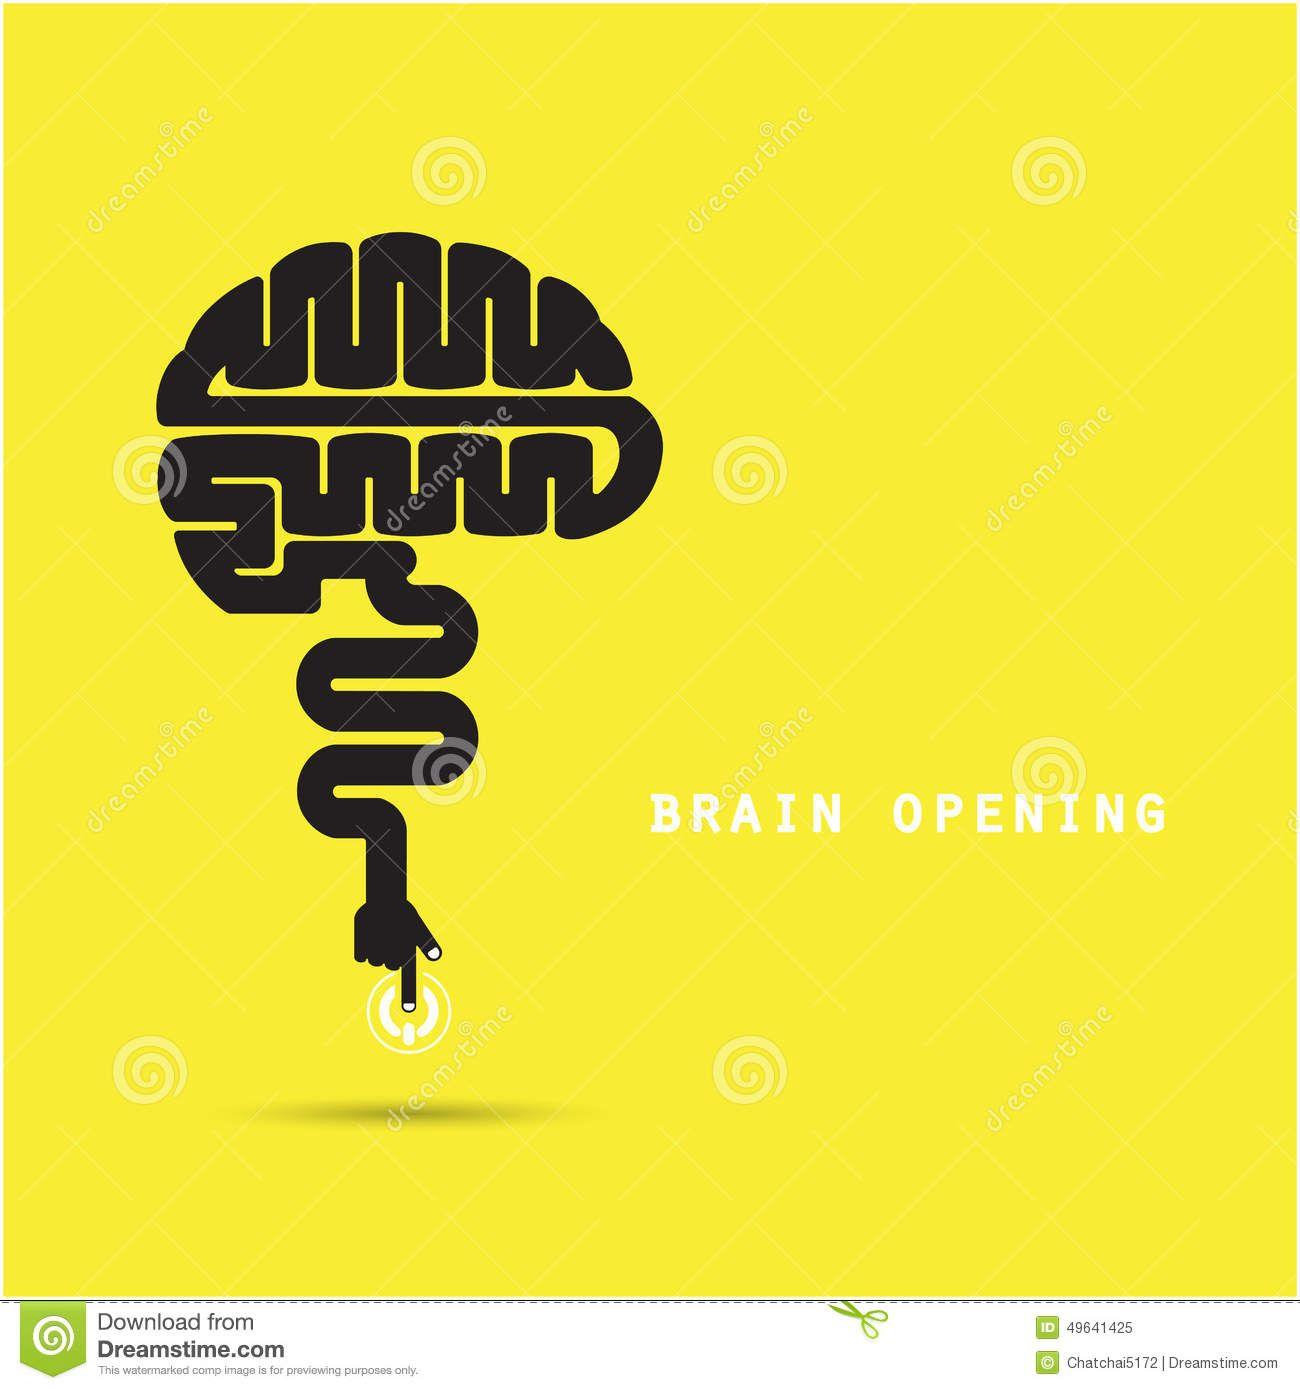 creative box design templates - Google Search | Graphic Design ... for Creative Logo Designs Ideas B  197uhy